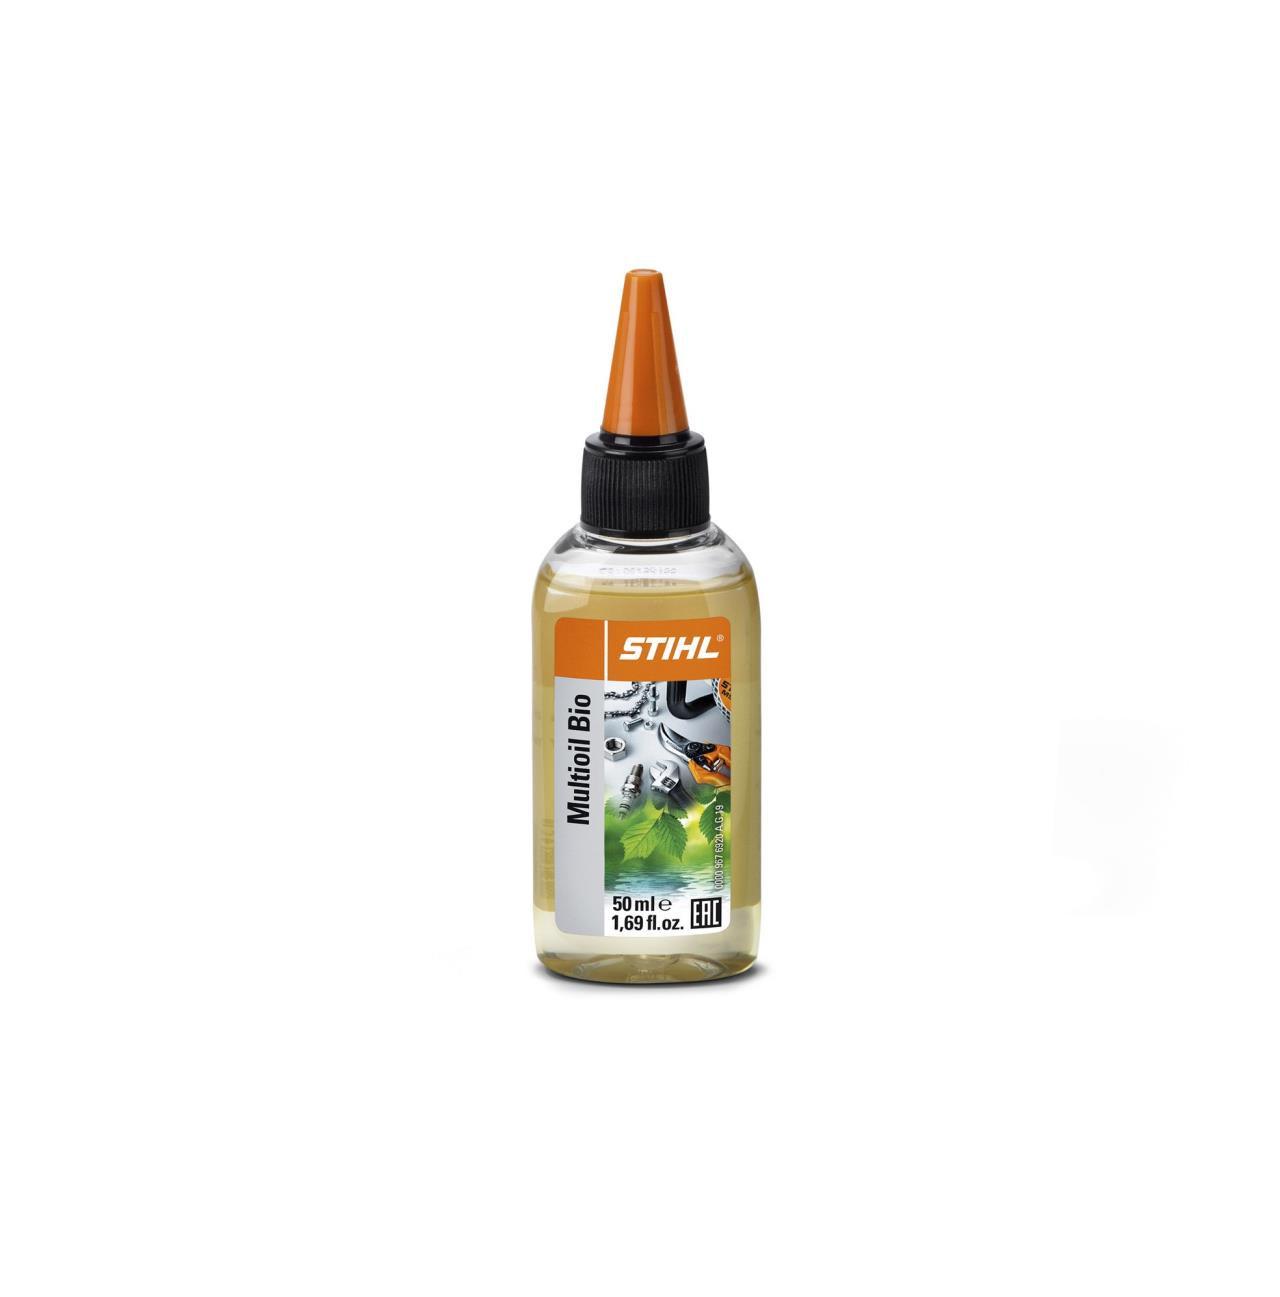 Stihl Multioil Bio, 50 ml. f.eks. til GTA26